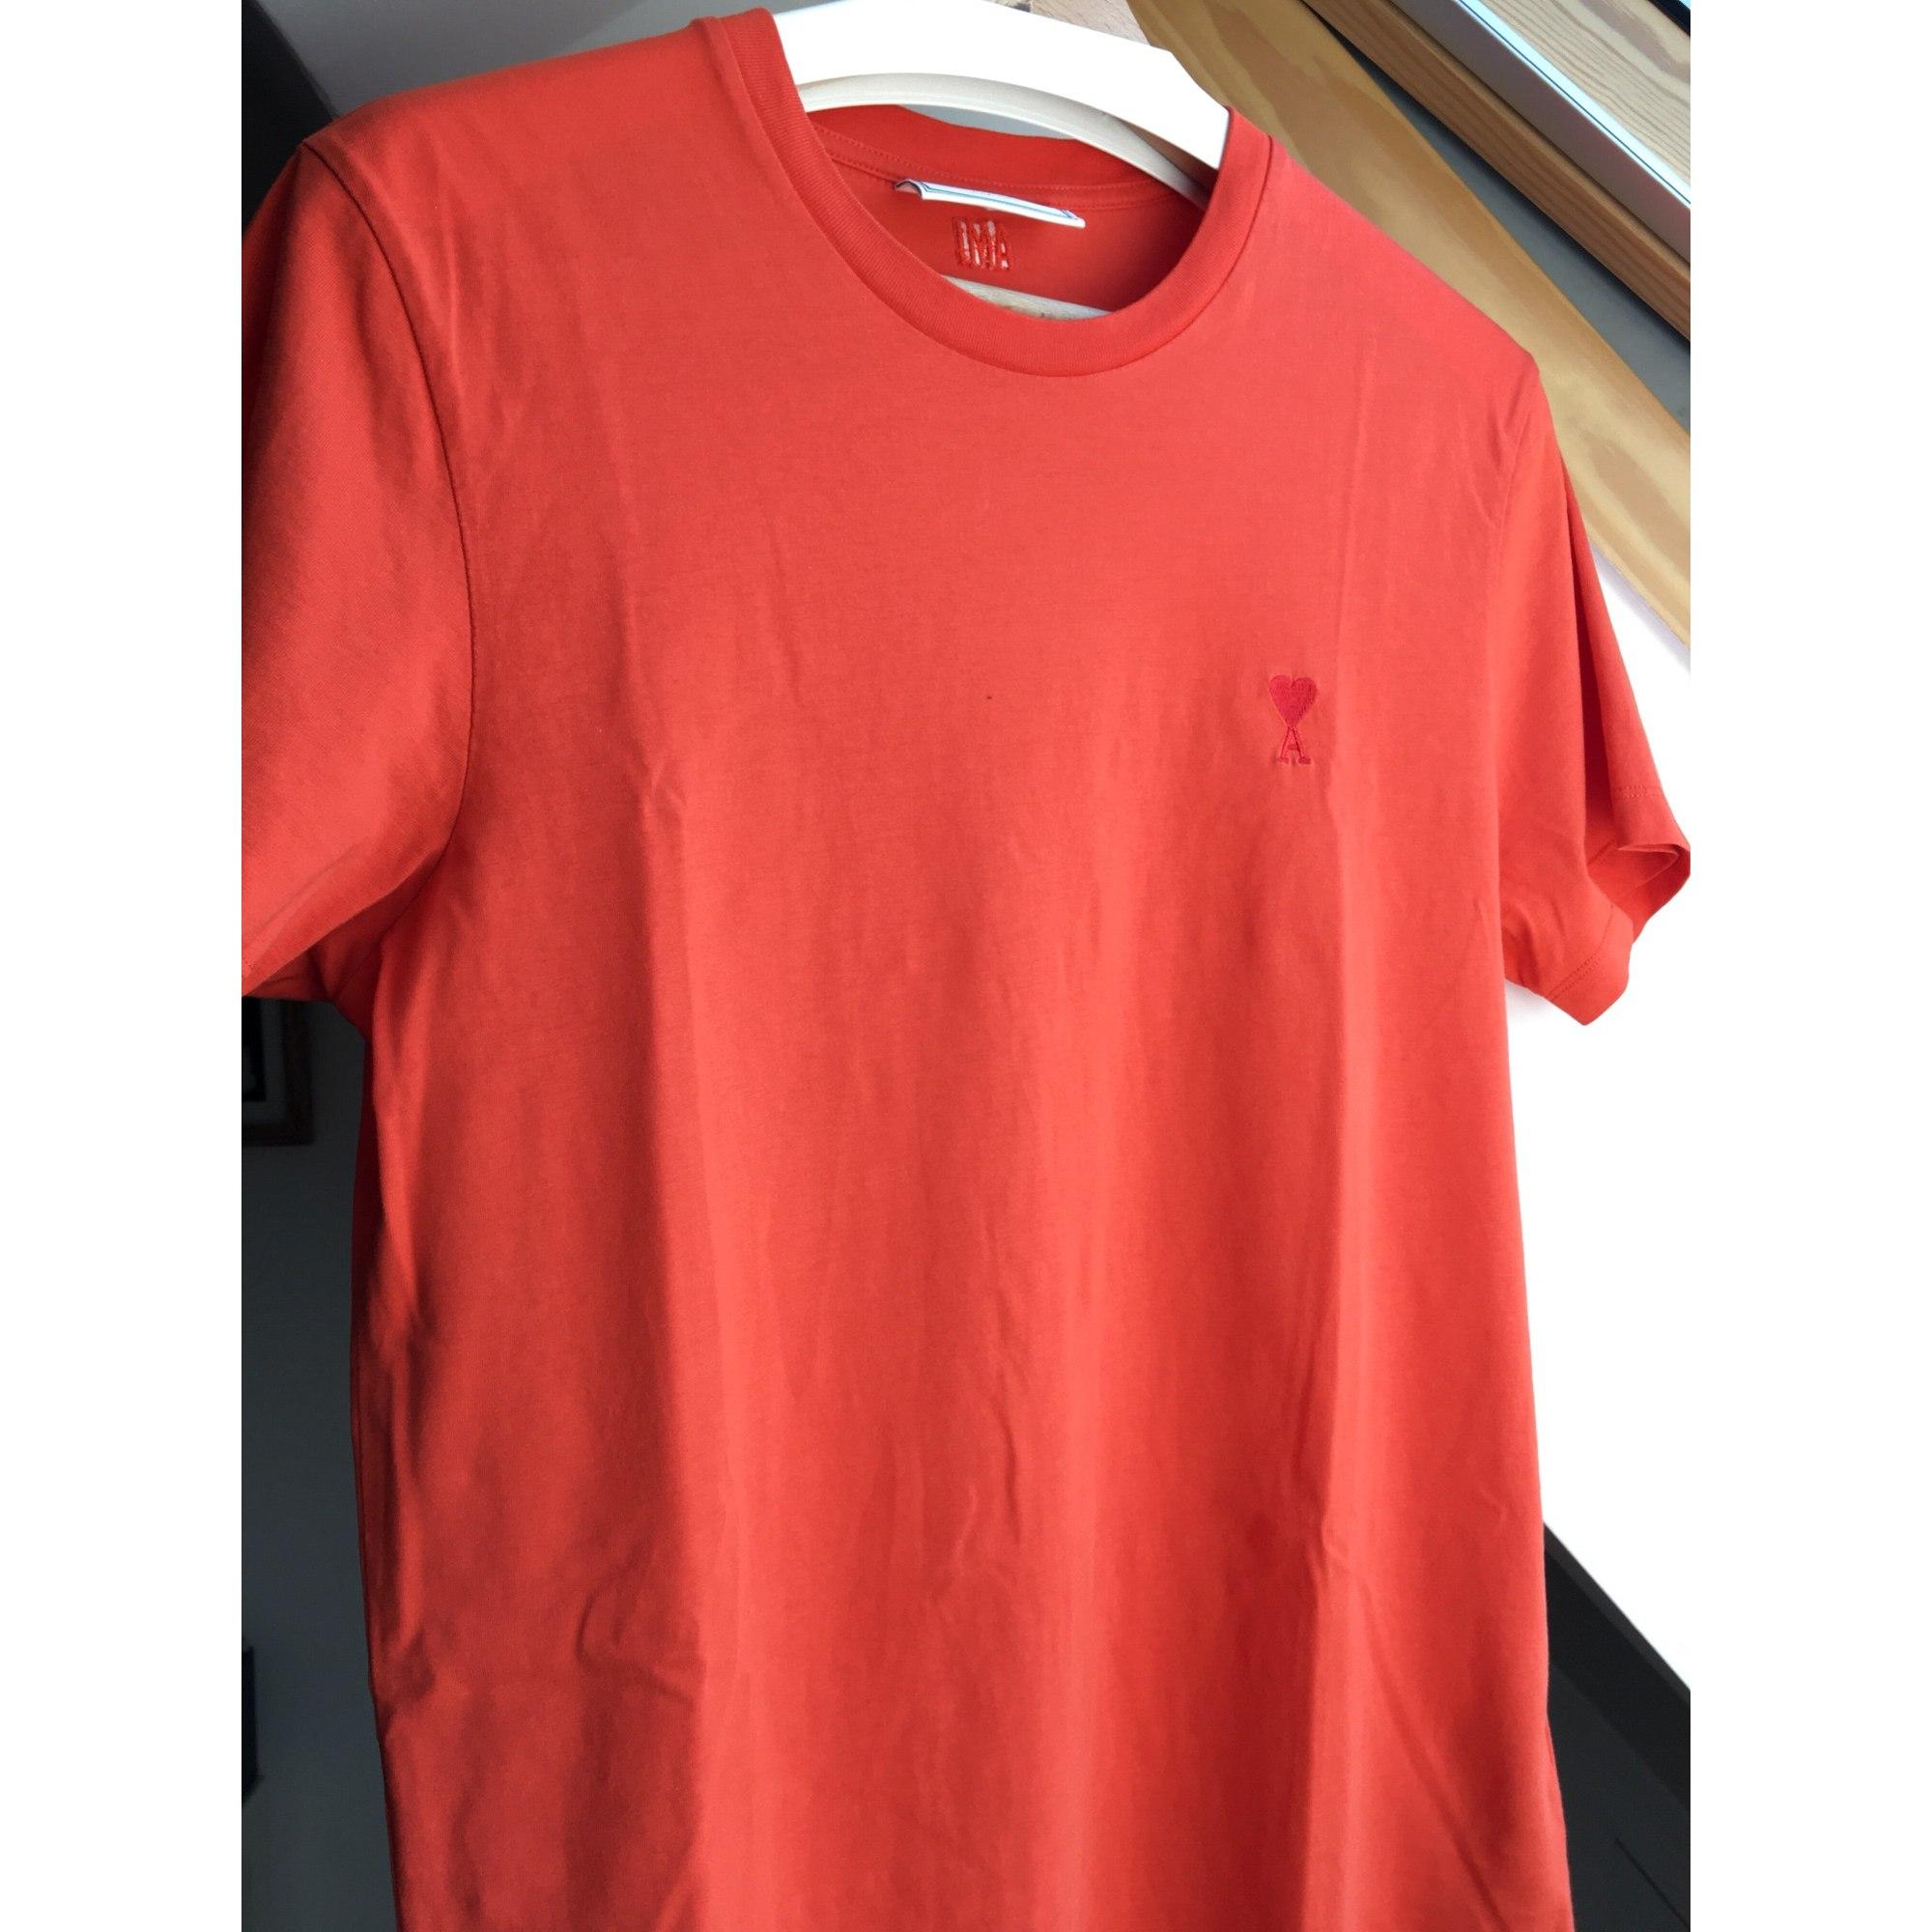 Tee-shirt AMI Orange